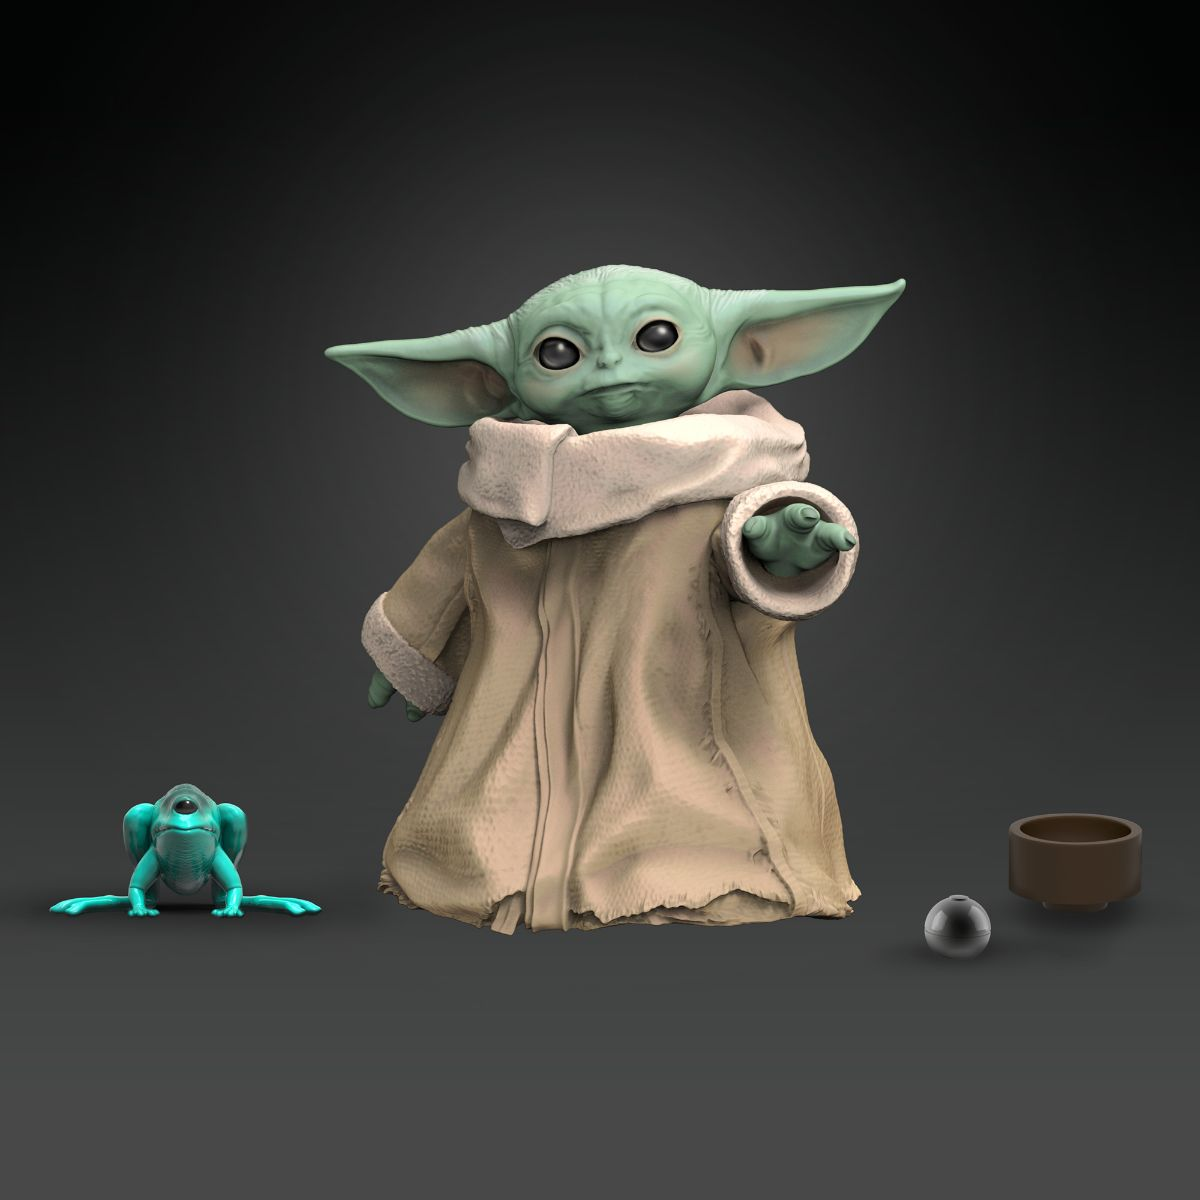 NEW x4 Mandalorian Baby Yoda Minifigure Pack : US Seller Ships Immediately